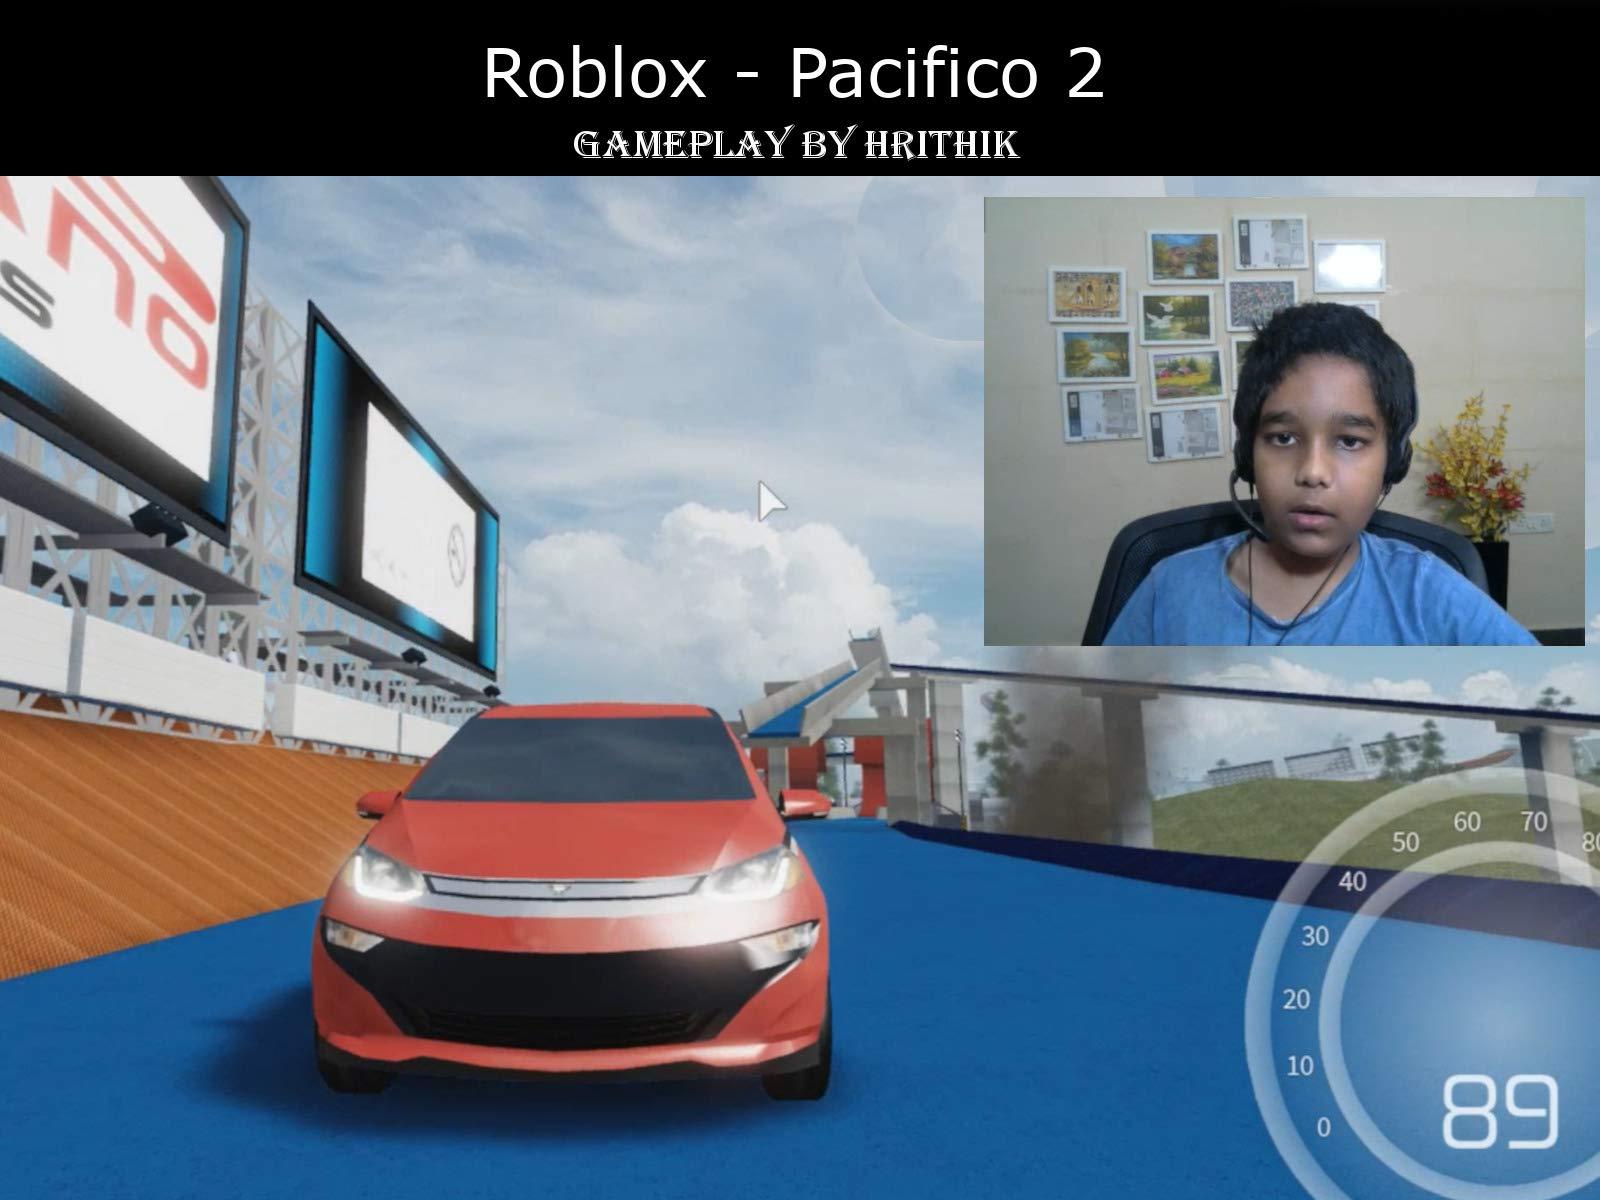 Pacifico 2 roblox code